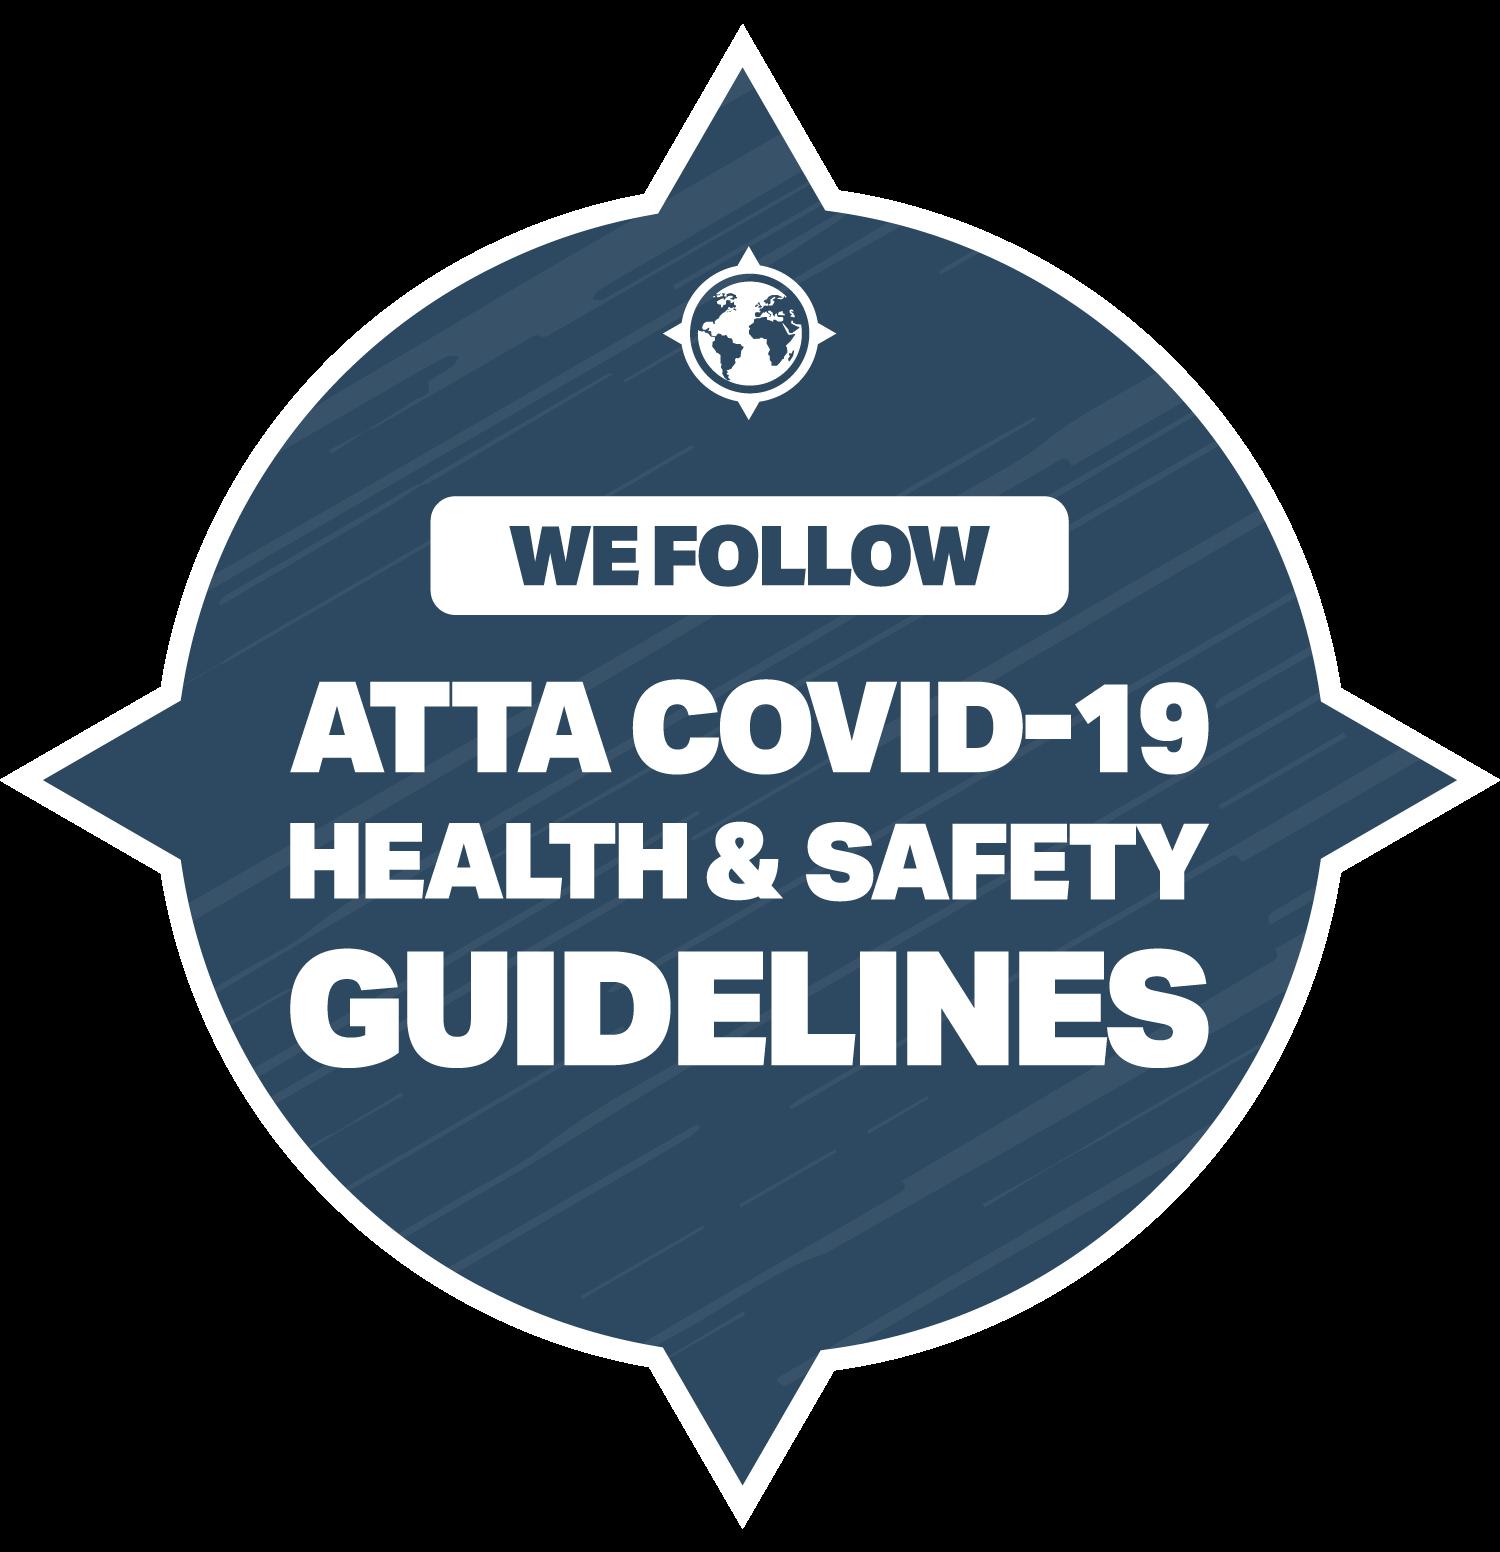 Covid-19 Badge